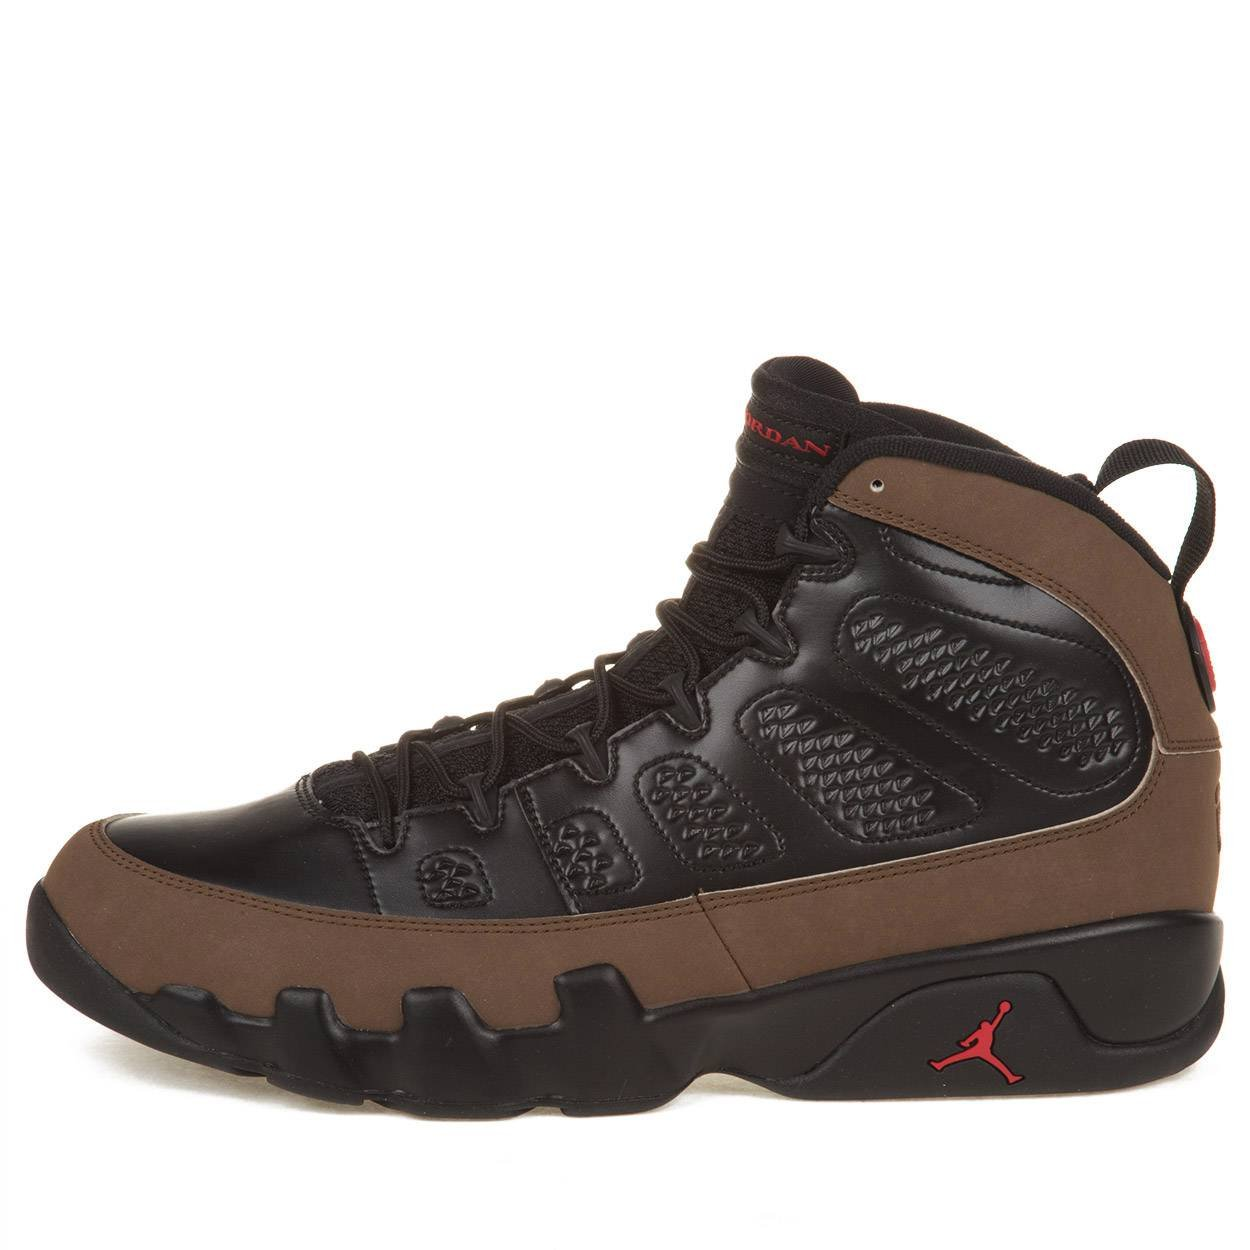 58a44f9e871 Amazon.com | Nike Mens Air Jordan 9 Retro Olive Leather Basketball Shoes |  Basketball